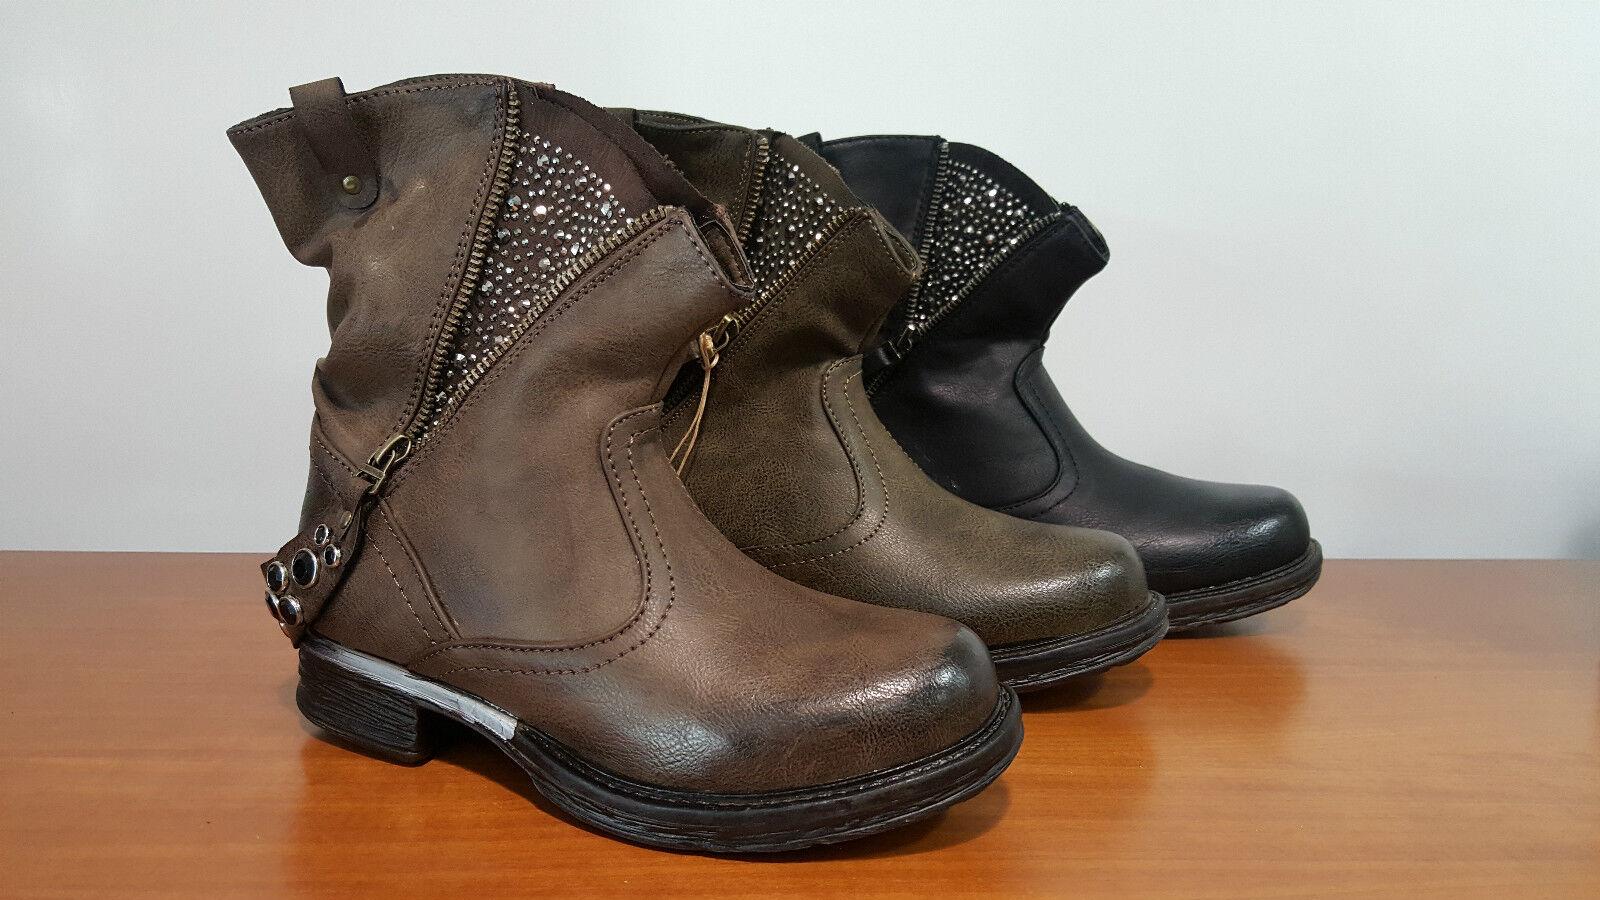 shoes women STIVALI STIVALETTI BASSI ECOPELLE BIKER BOOTS BOTAS STIEFEL ANFIBI